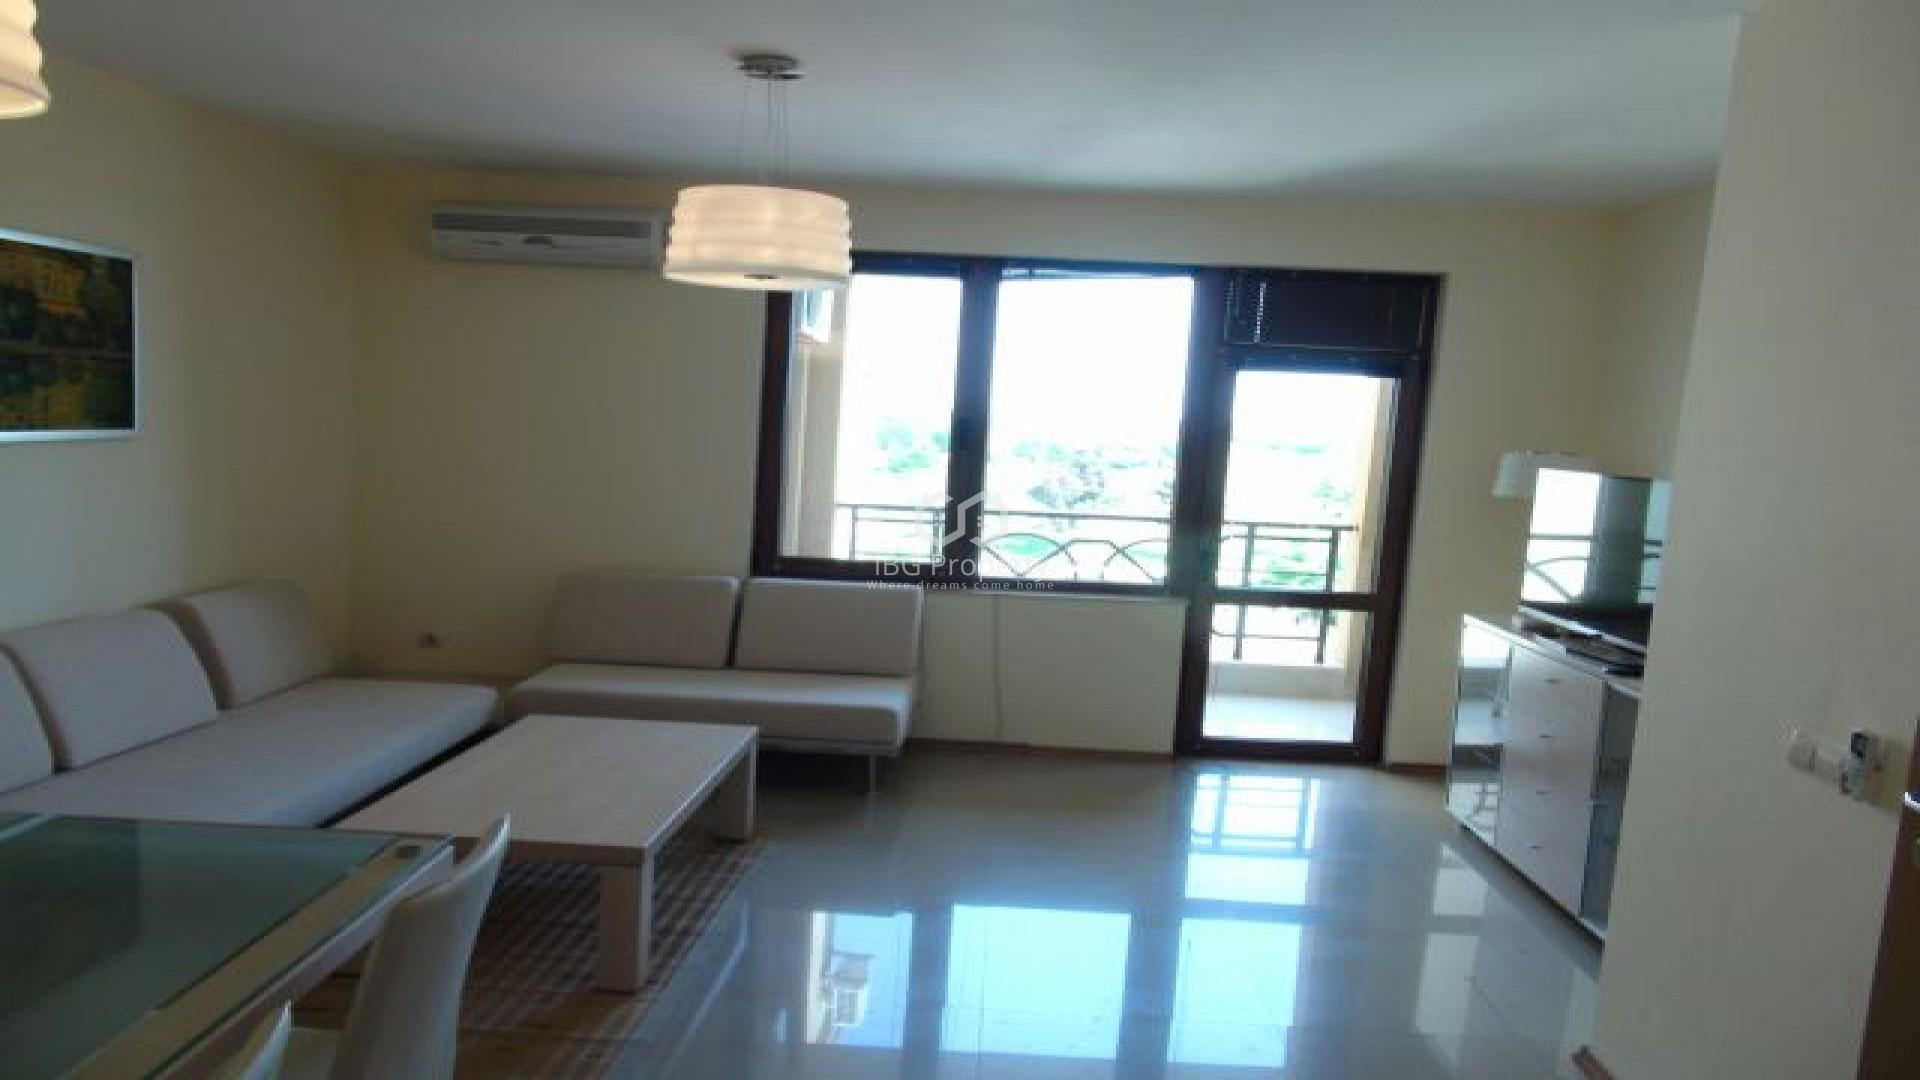 Двустаен апартамент Балчик 67 m2